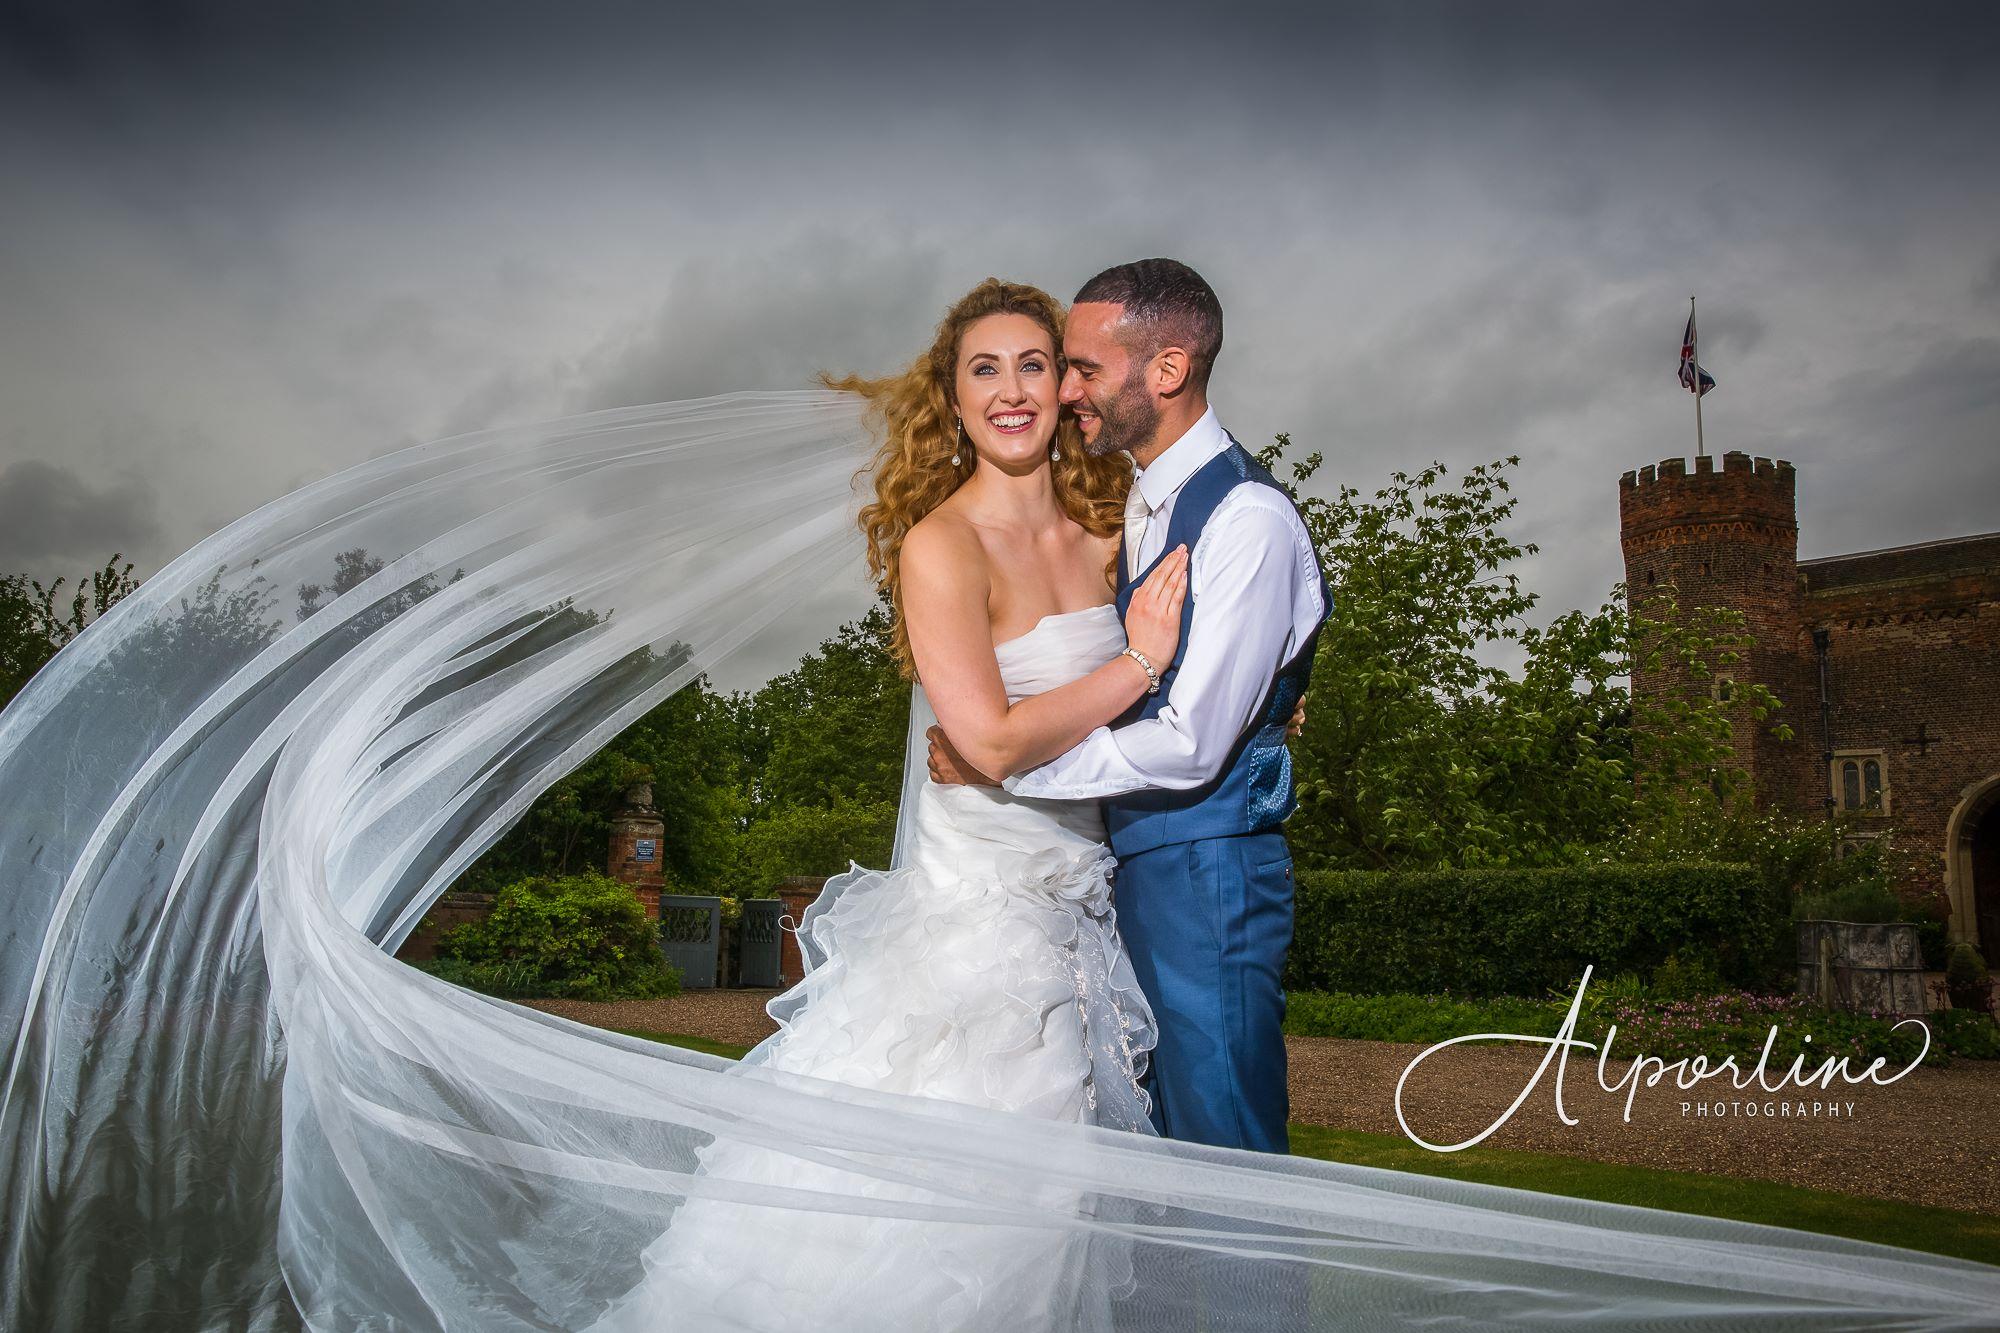 Blackpool-wedding-photograph-blackpool-wedding-photographer.jpg